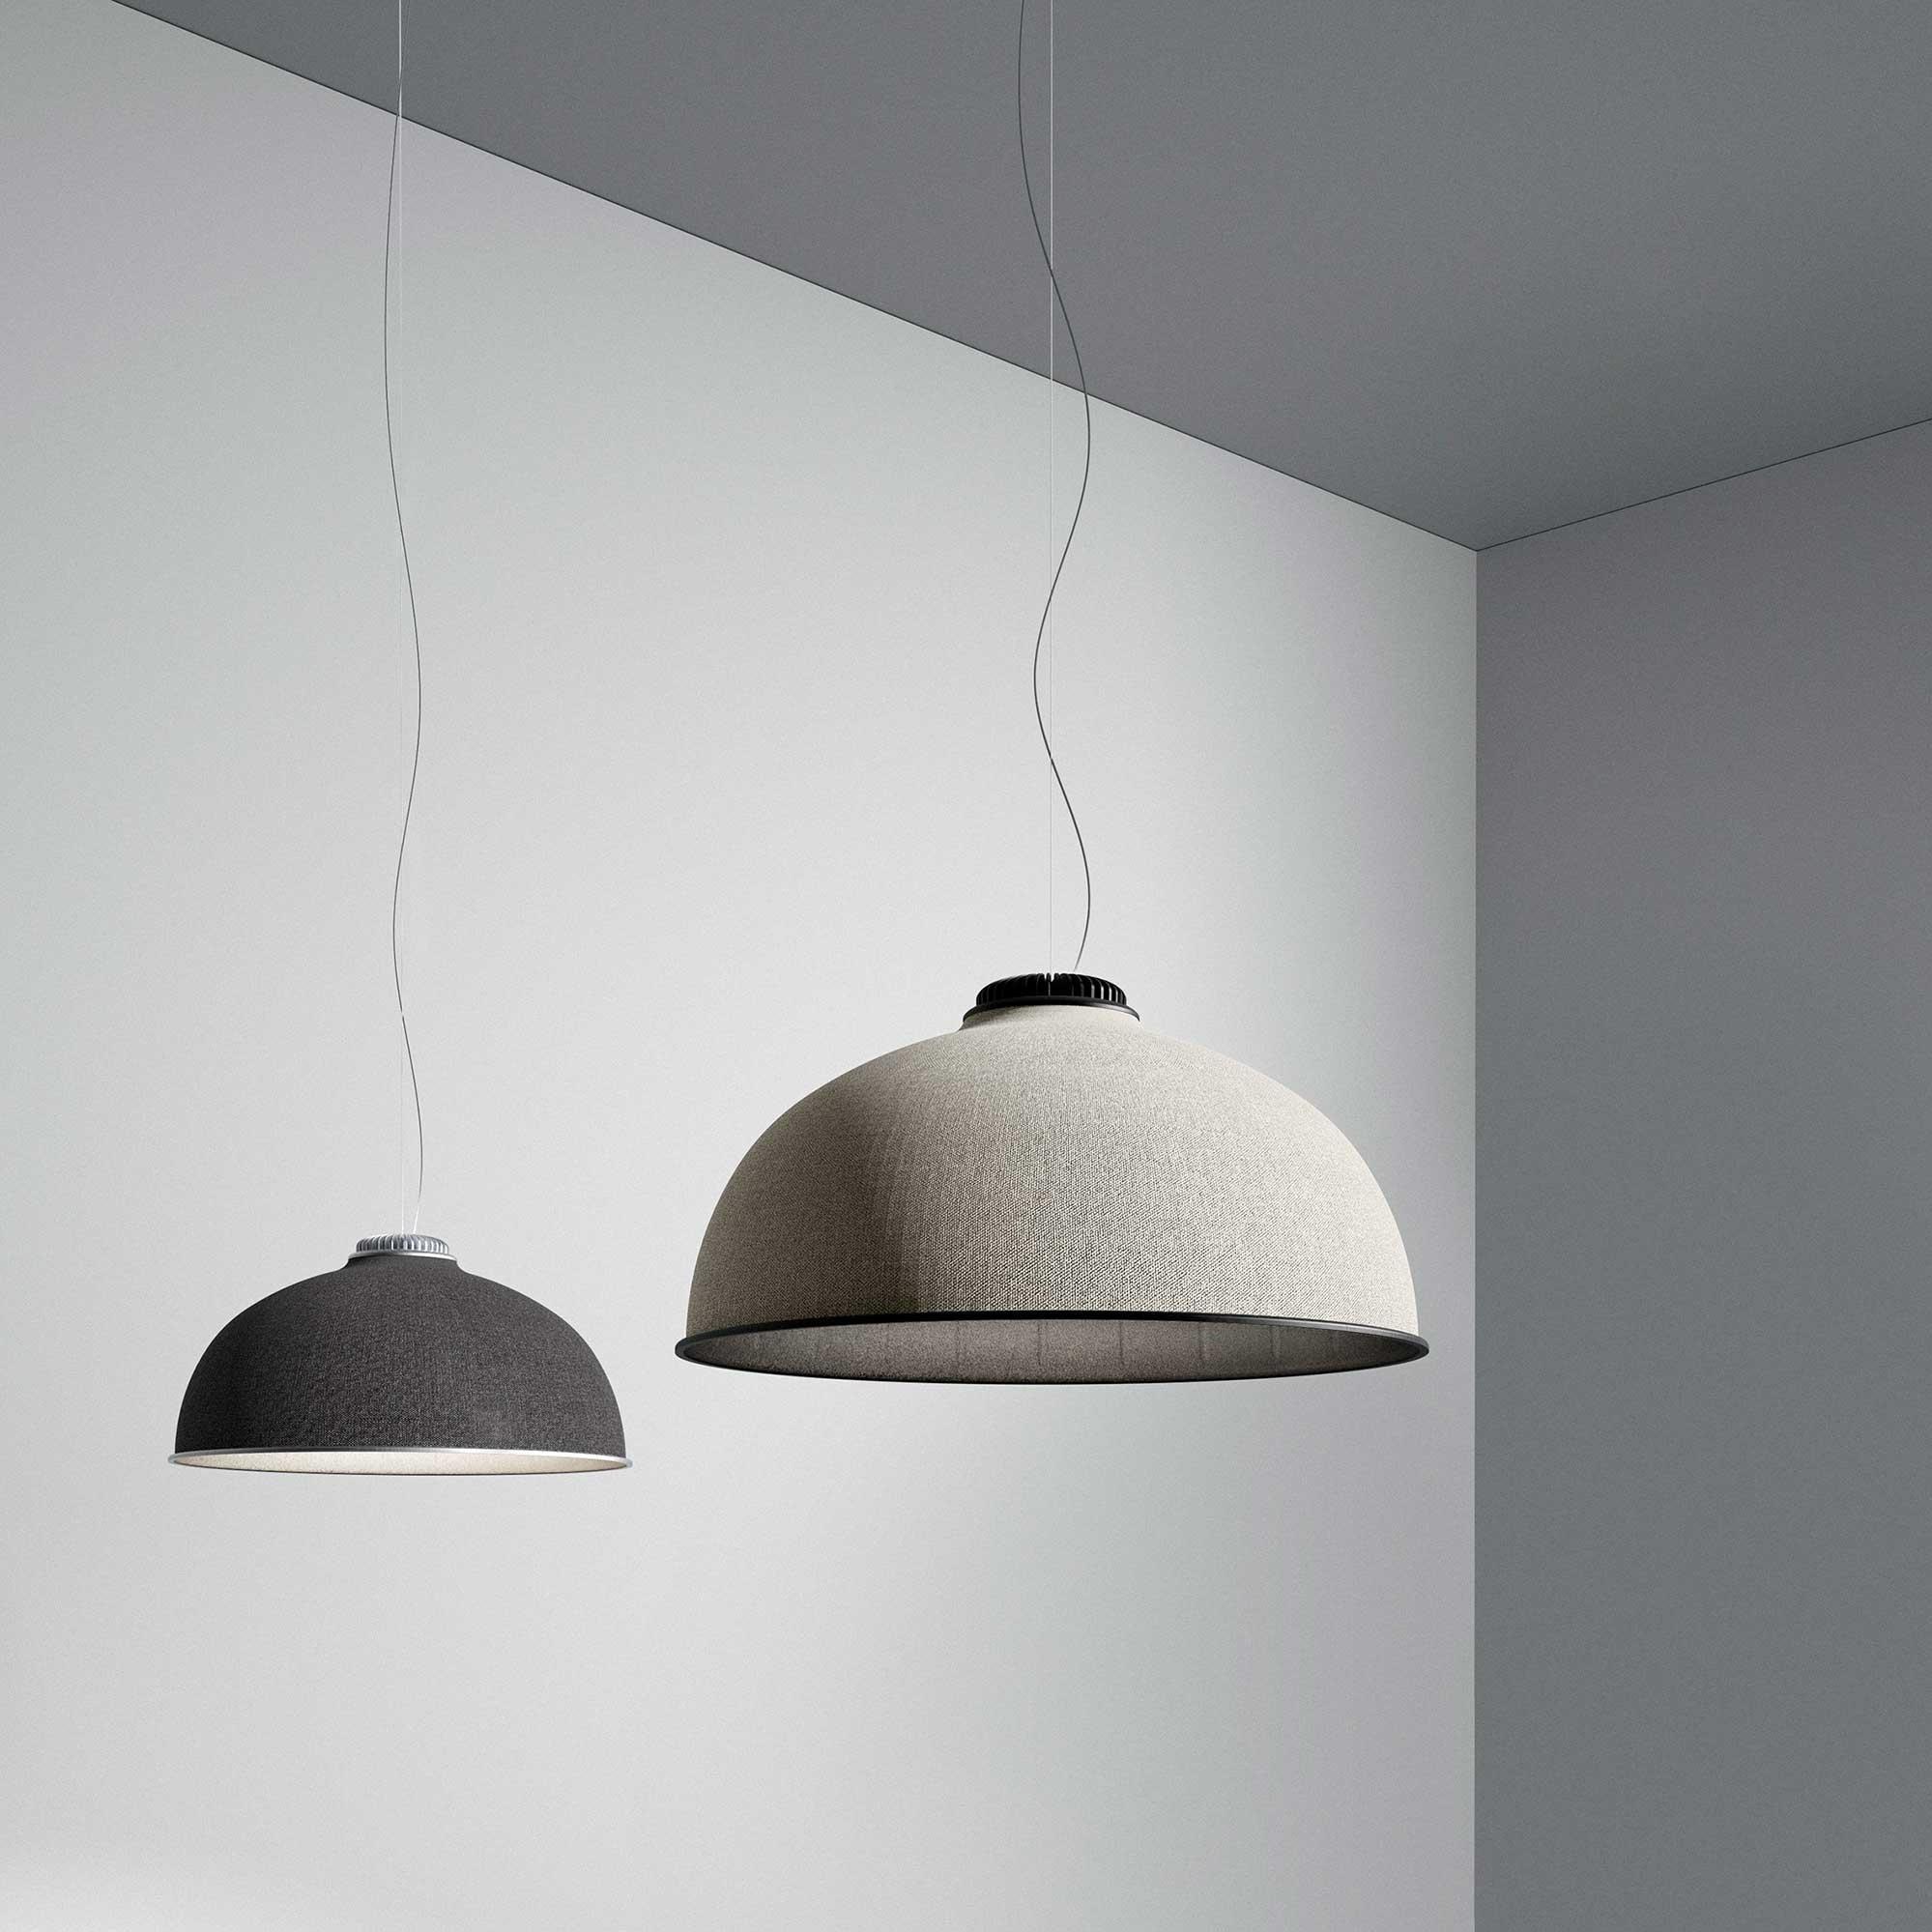 Farel D96 Led Suspension Lamp